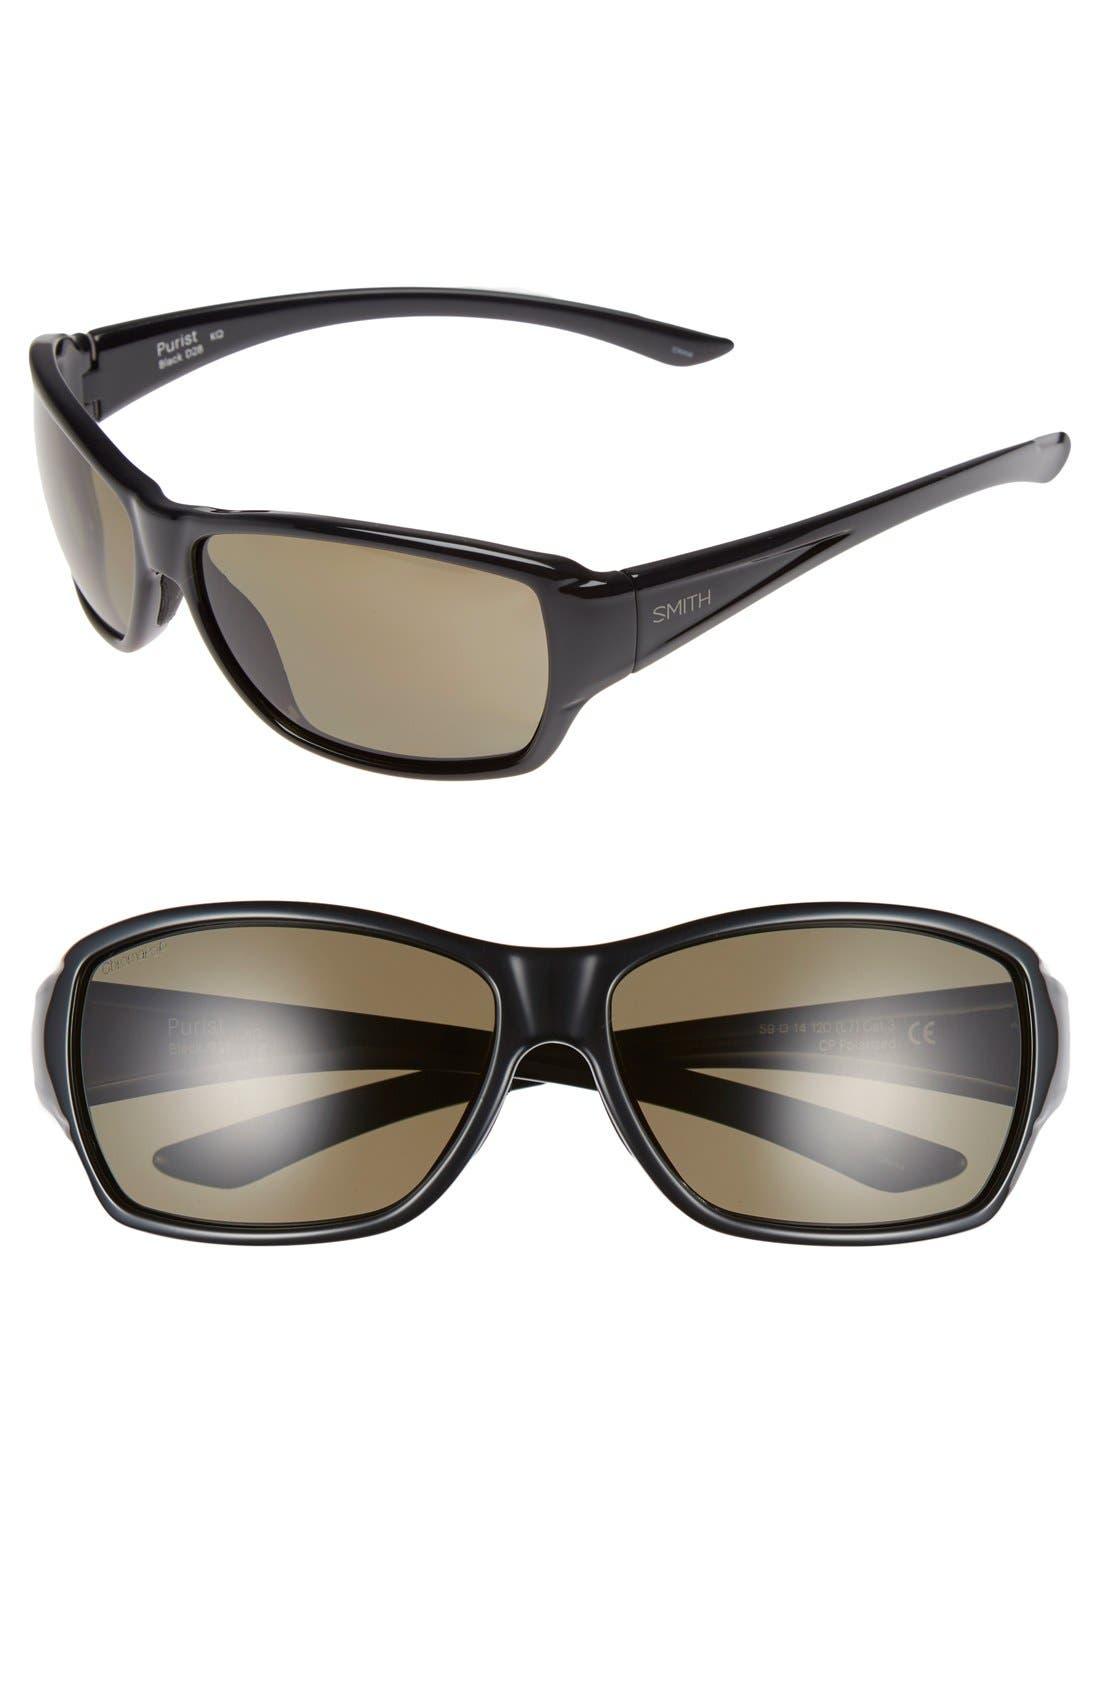 Alternate Image 1 Selected - Smith 'Purist' 59mm Polarized Sunglasses